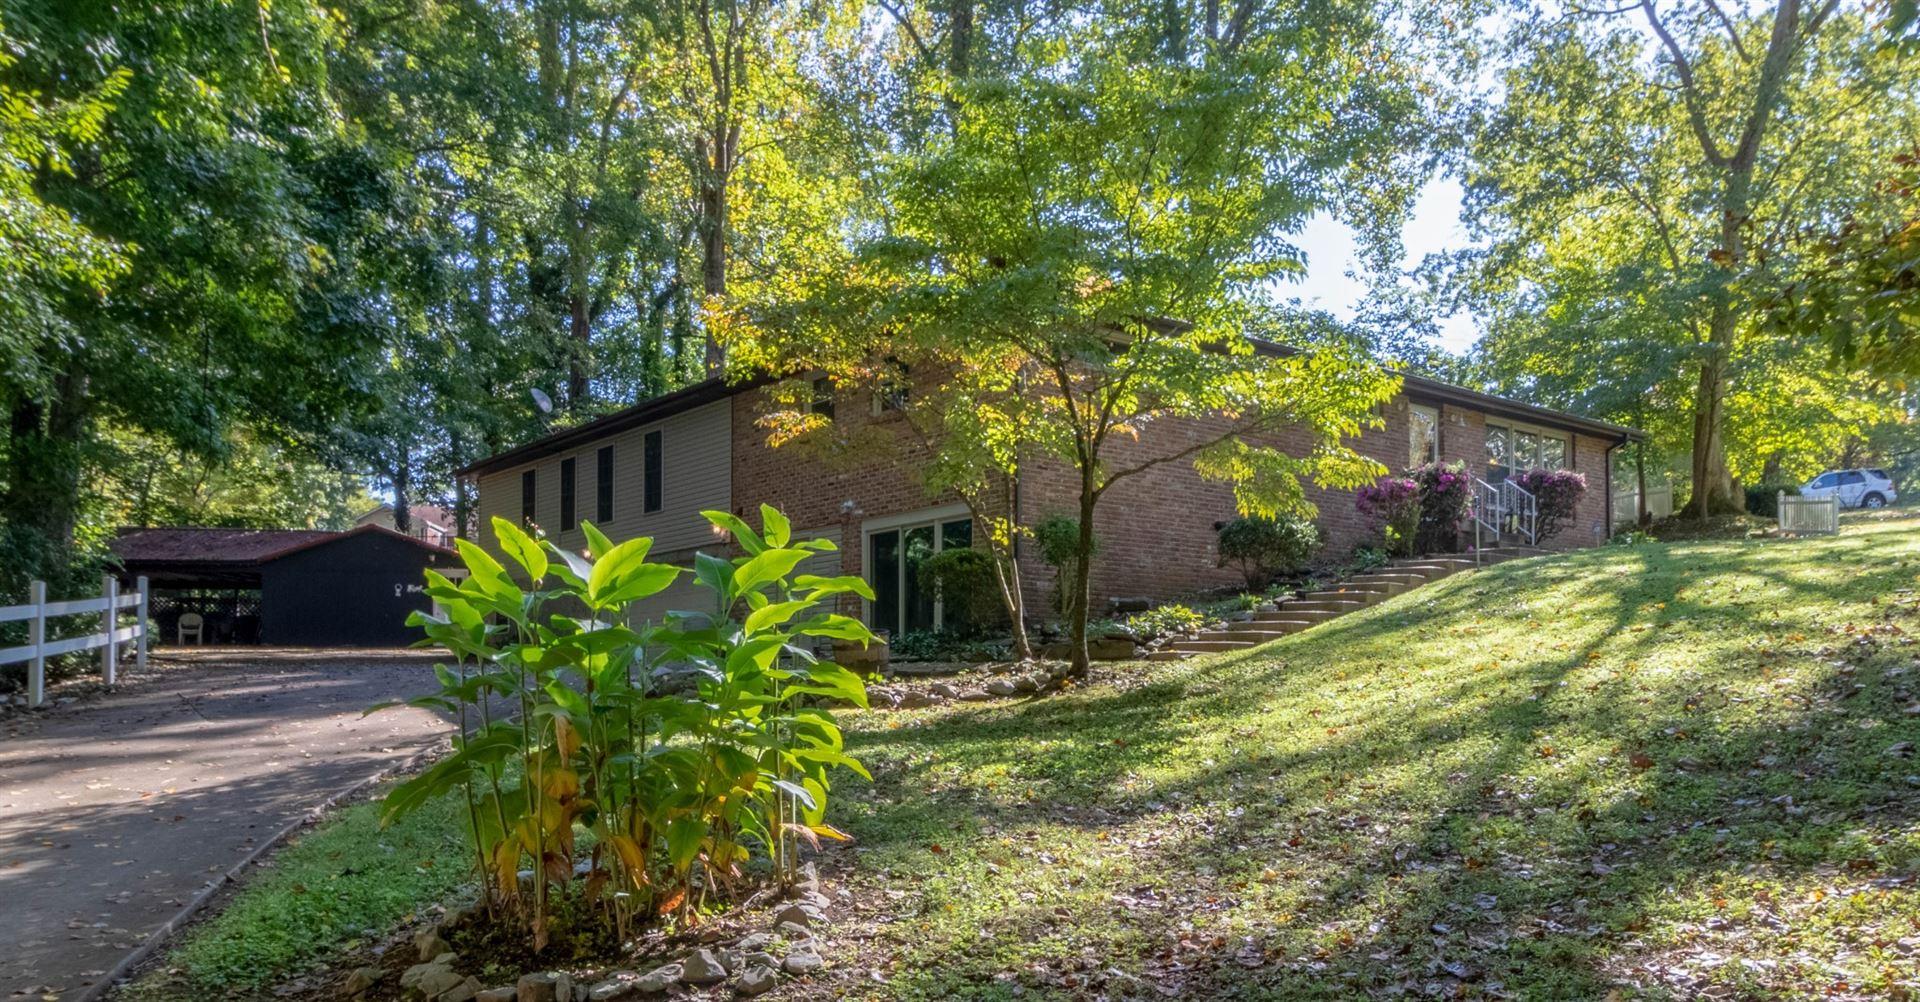 1605 Eastern Hills Dr, Clarksville, TN 37043 - MLS#: 2193464